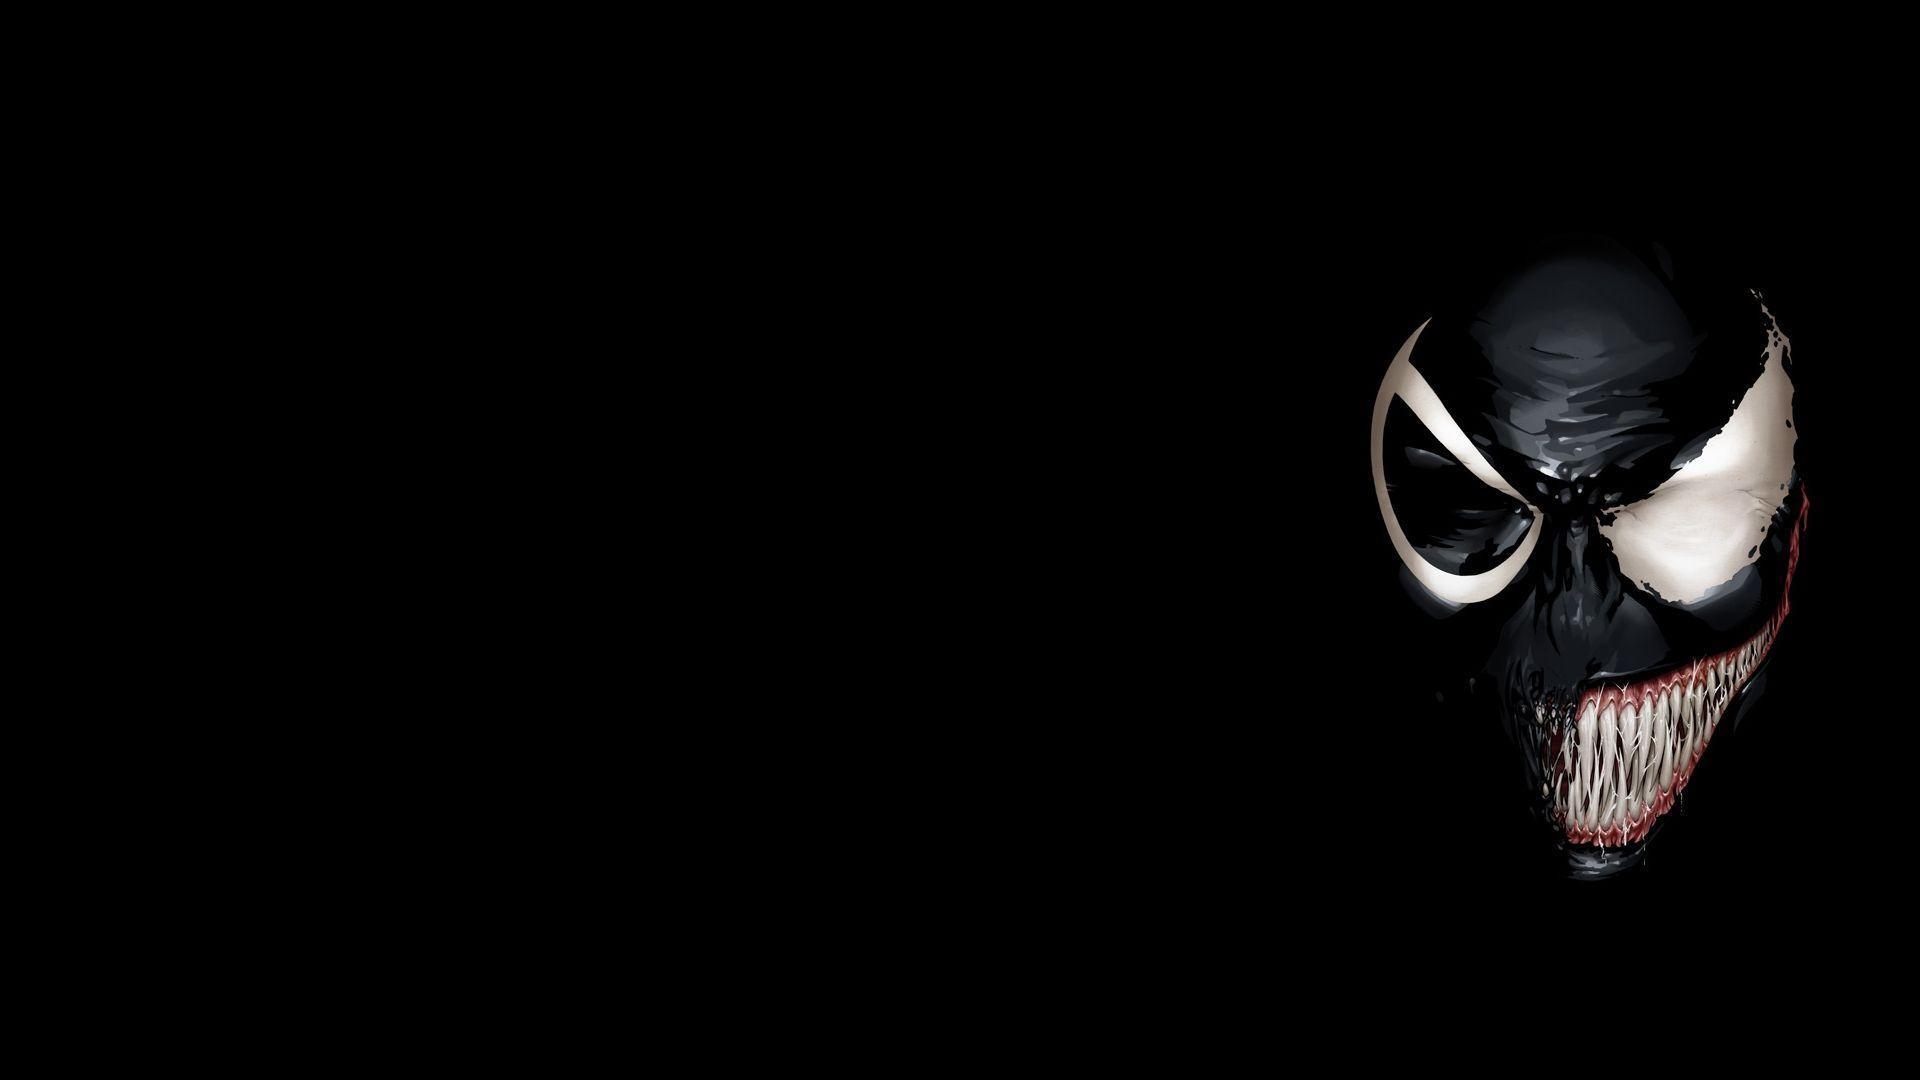 HD Agent Venom Wallpaper – WallpaperSafari